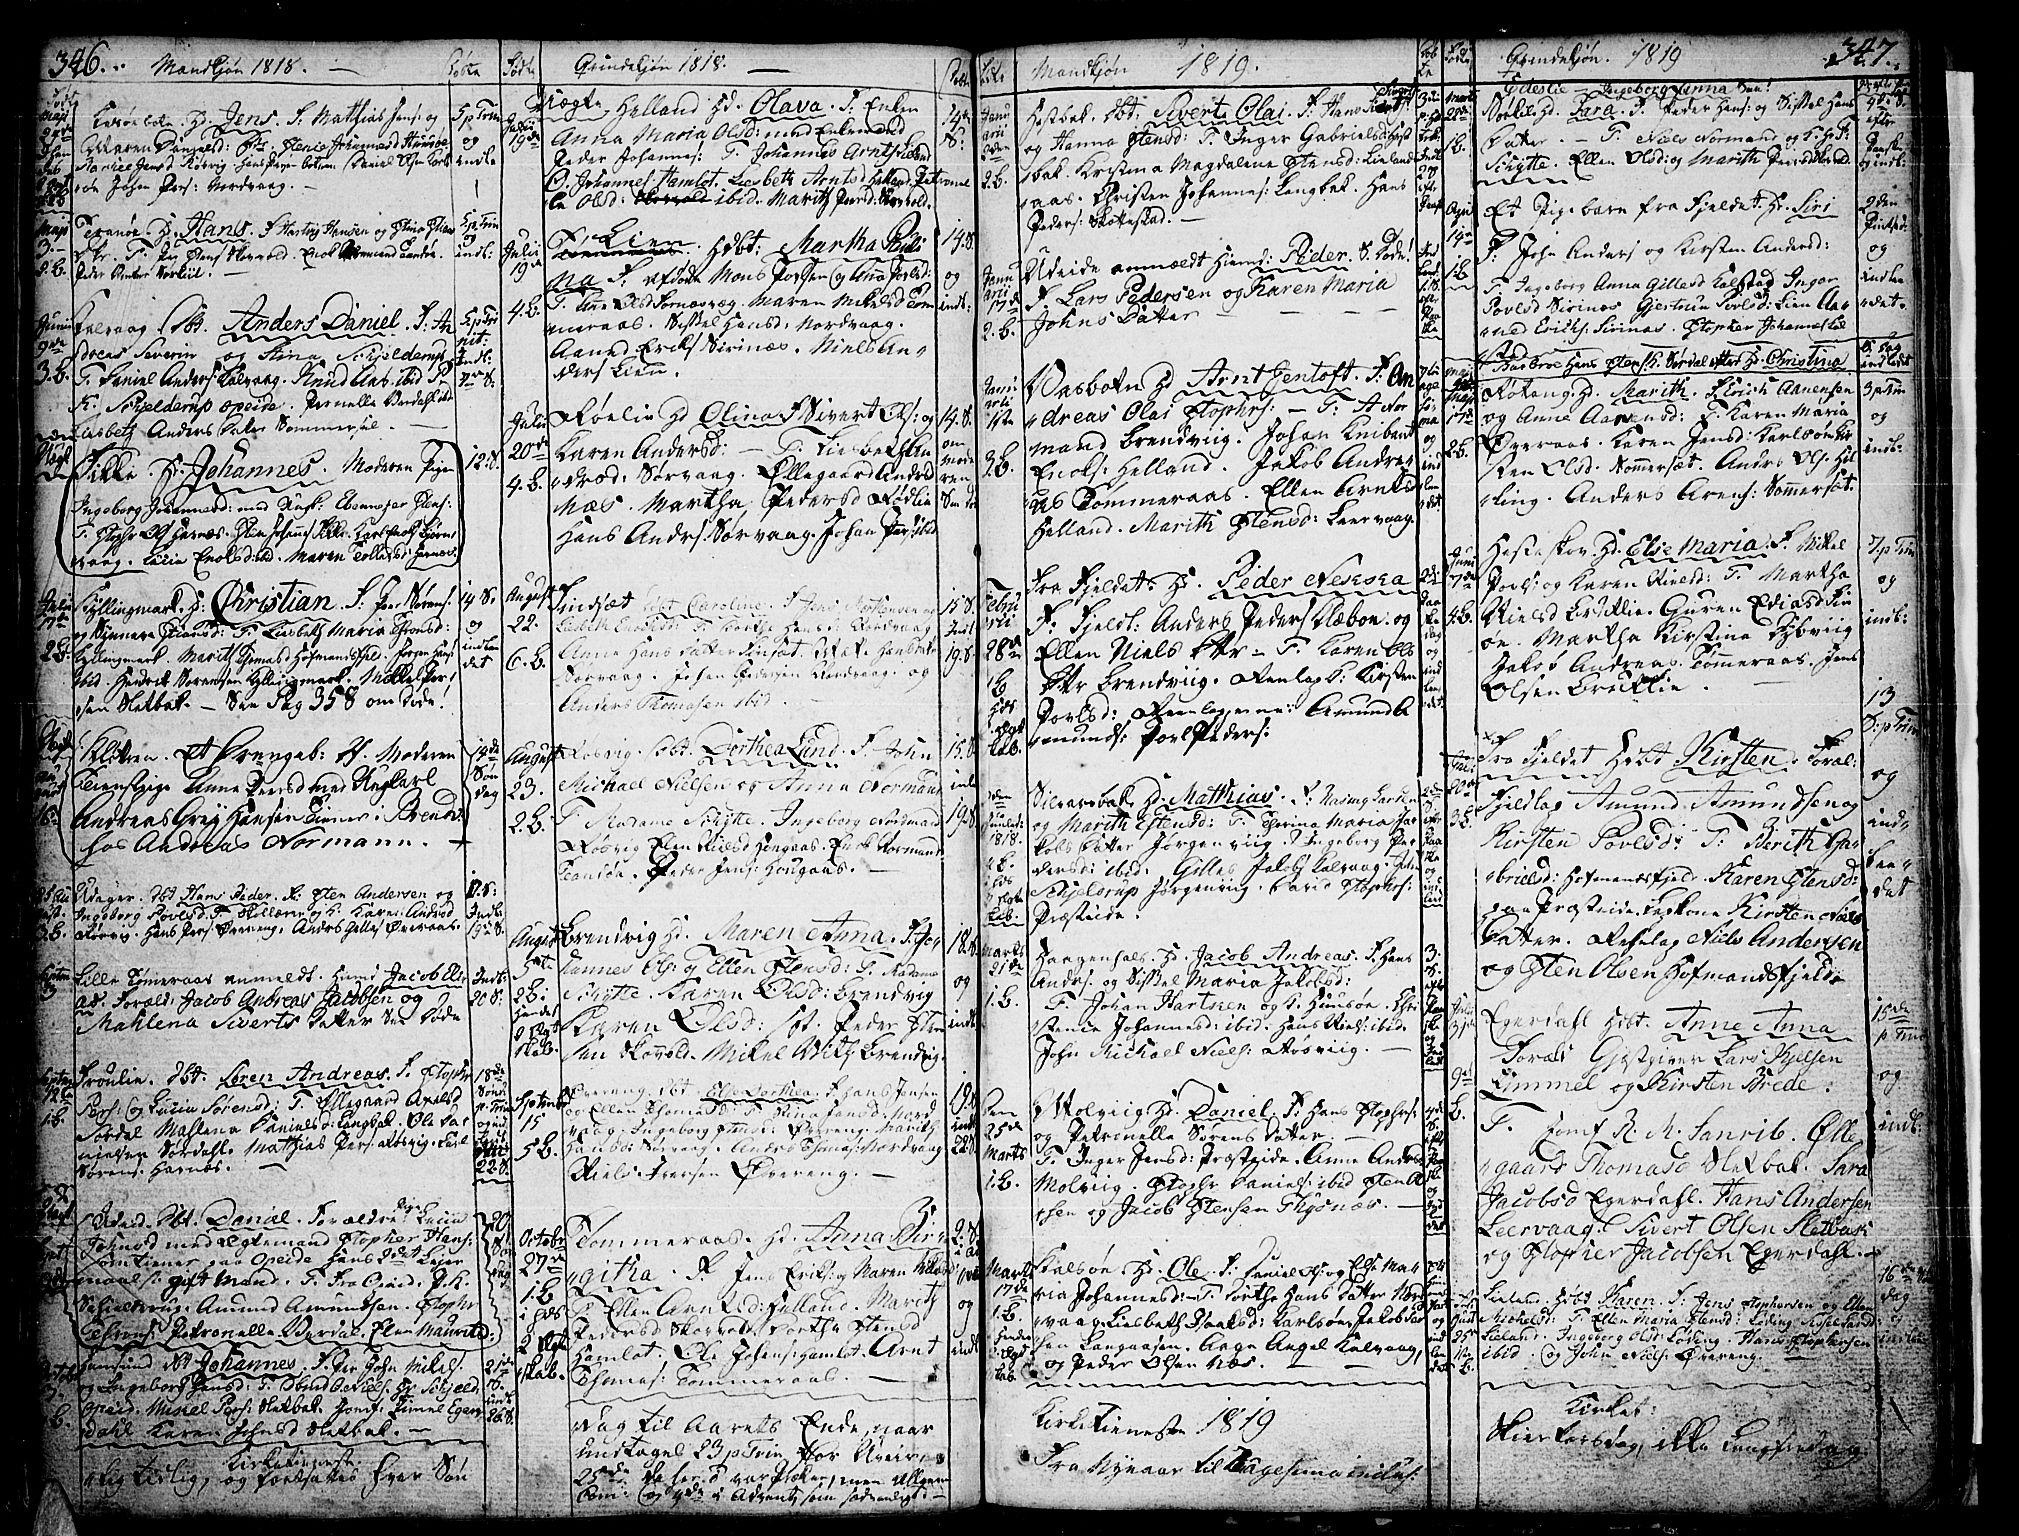 SAT, Ministerialprotokoller, klokkerbøker og fødselsregistre - Nordland, 859/L0841: Ministerialbok nr. 859A01, 1766-1821, s. 346-347